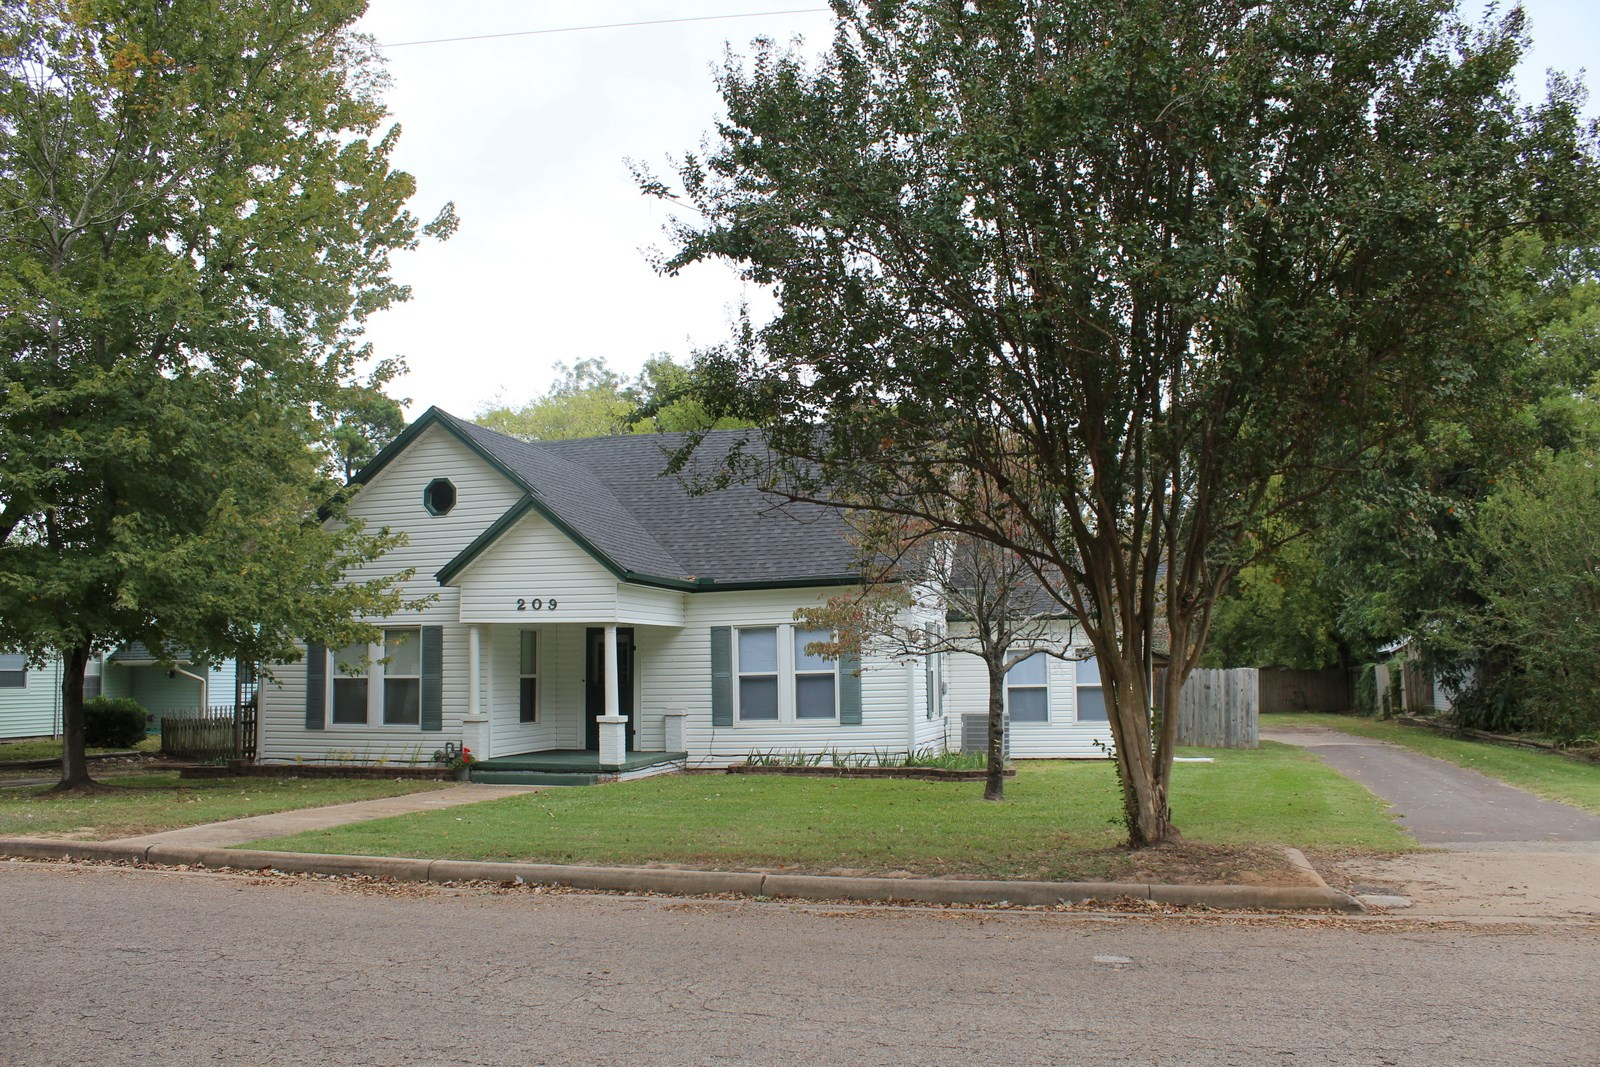 1930 3/2/2 UPDATED HOME - WINNSBORO, TX - WOOD COUNTY TEXAS